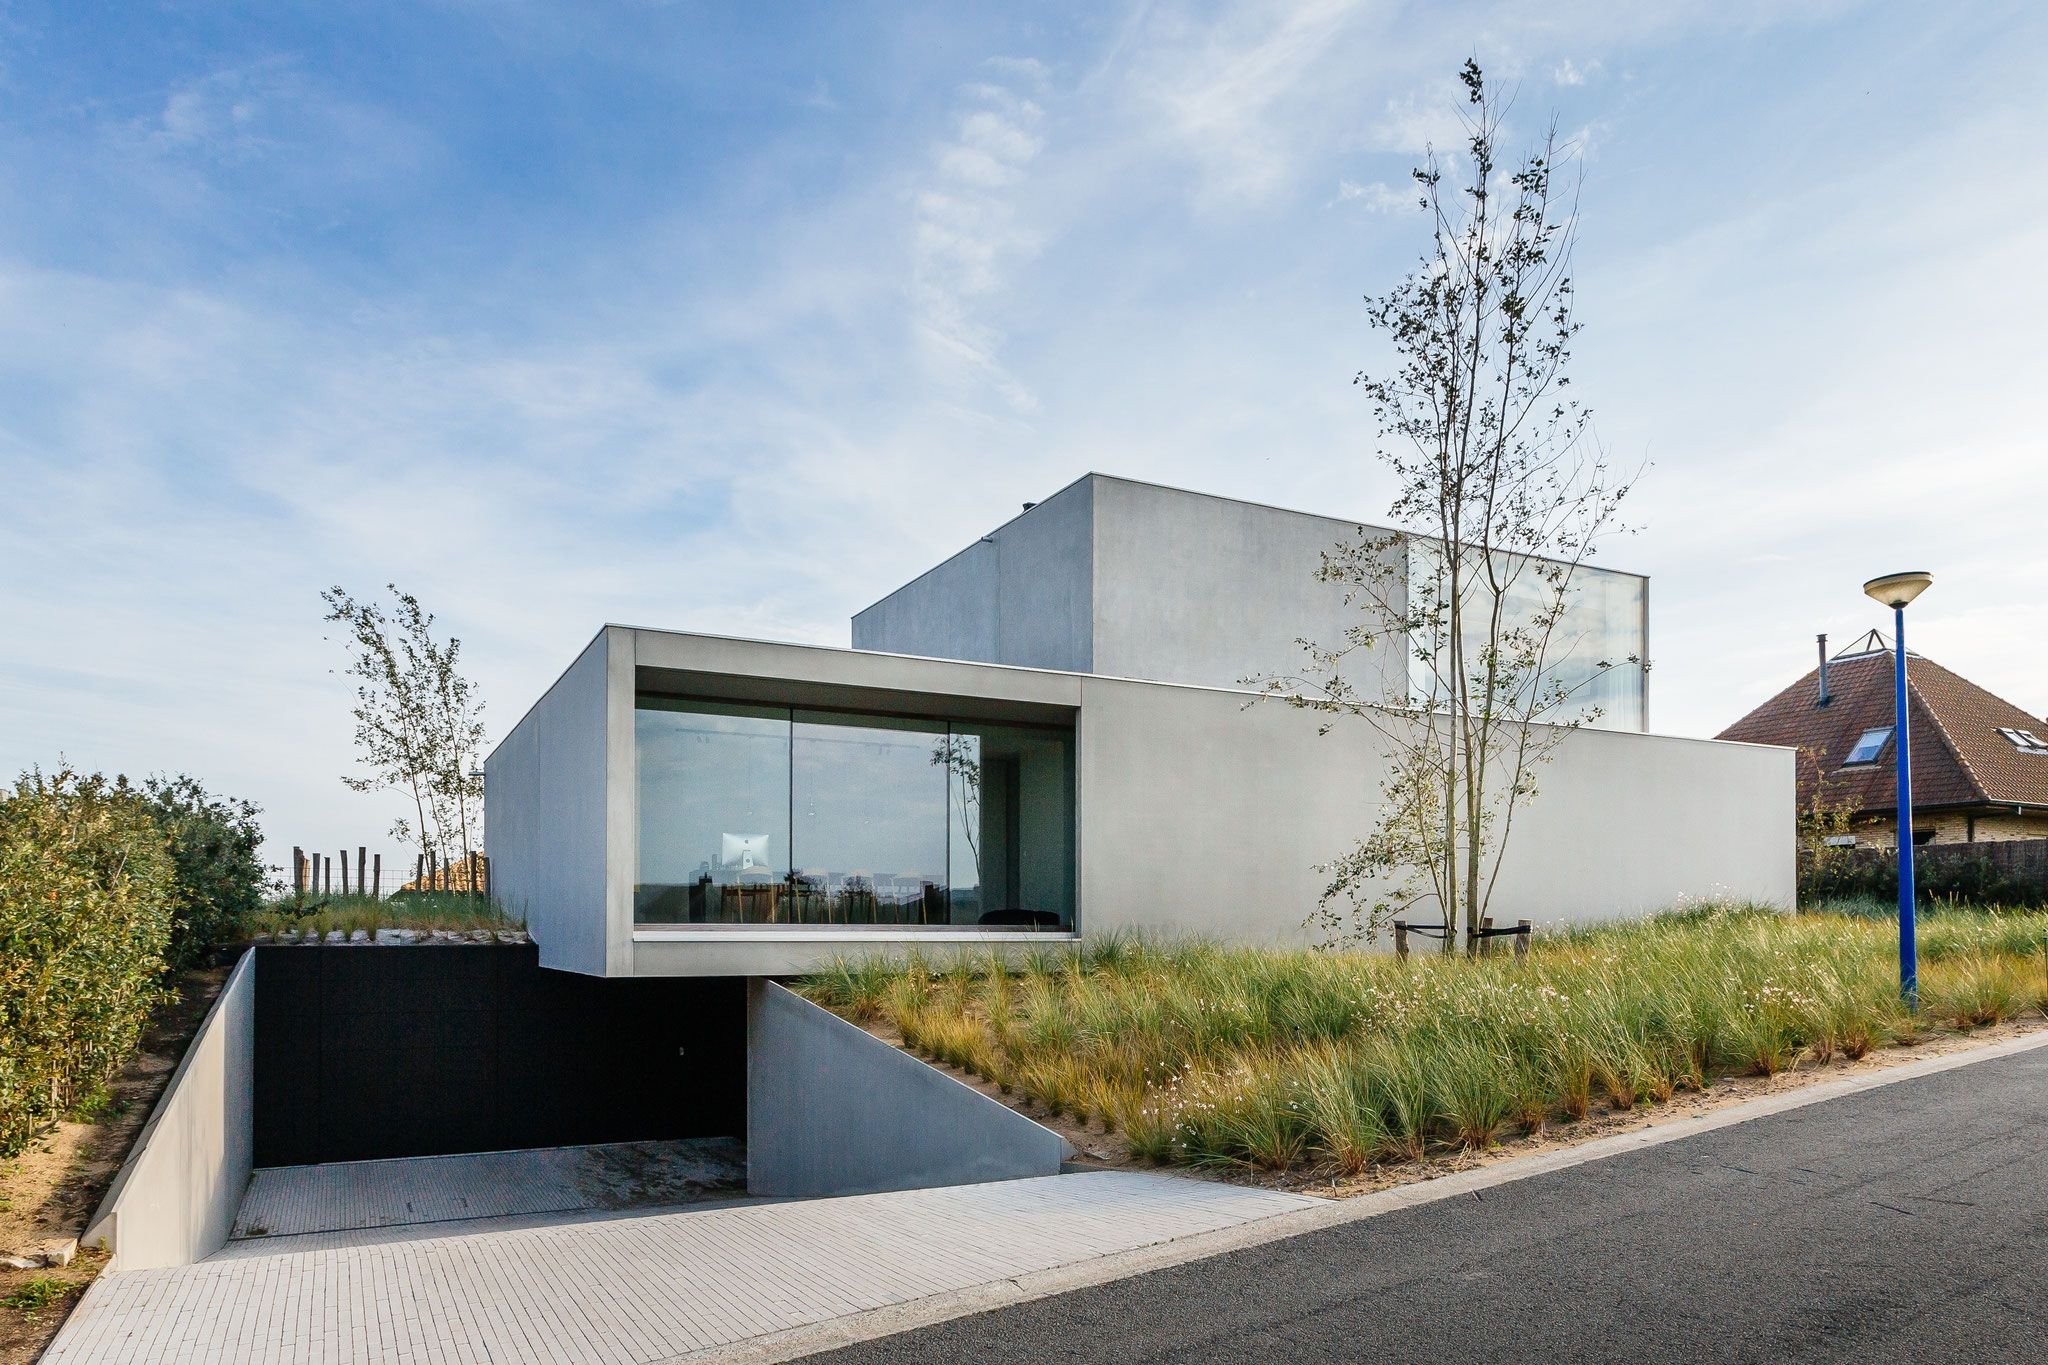 Einfache wohnarchitektur hall snel huizen bouw modulair bouwen prefab beton huizen huizen in